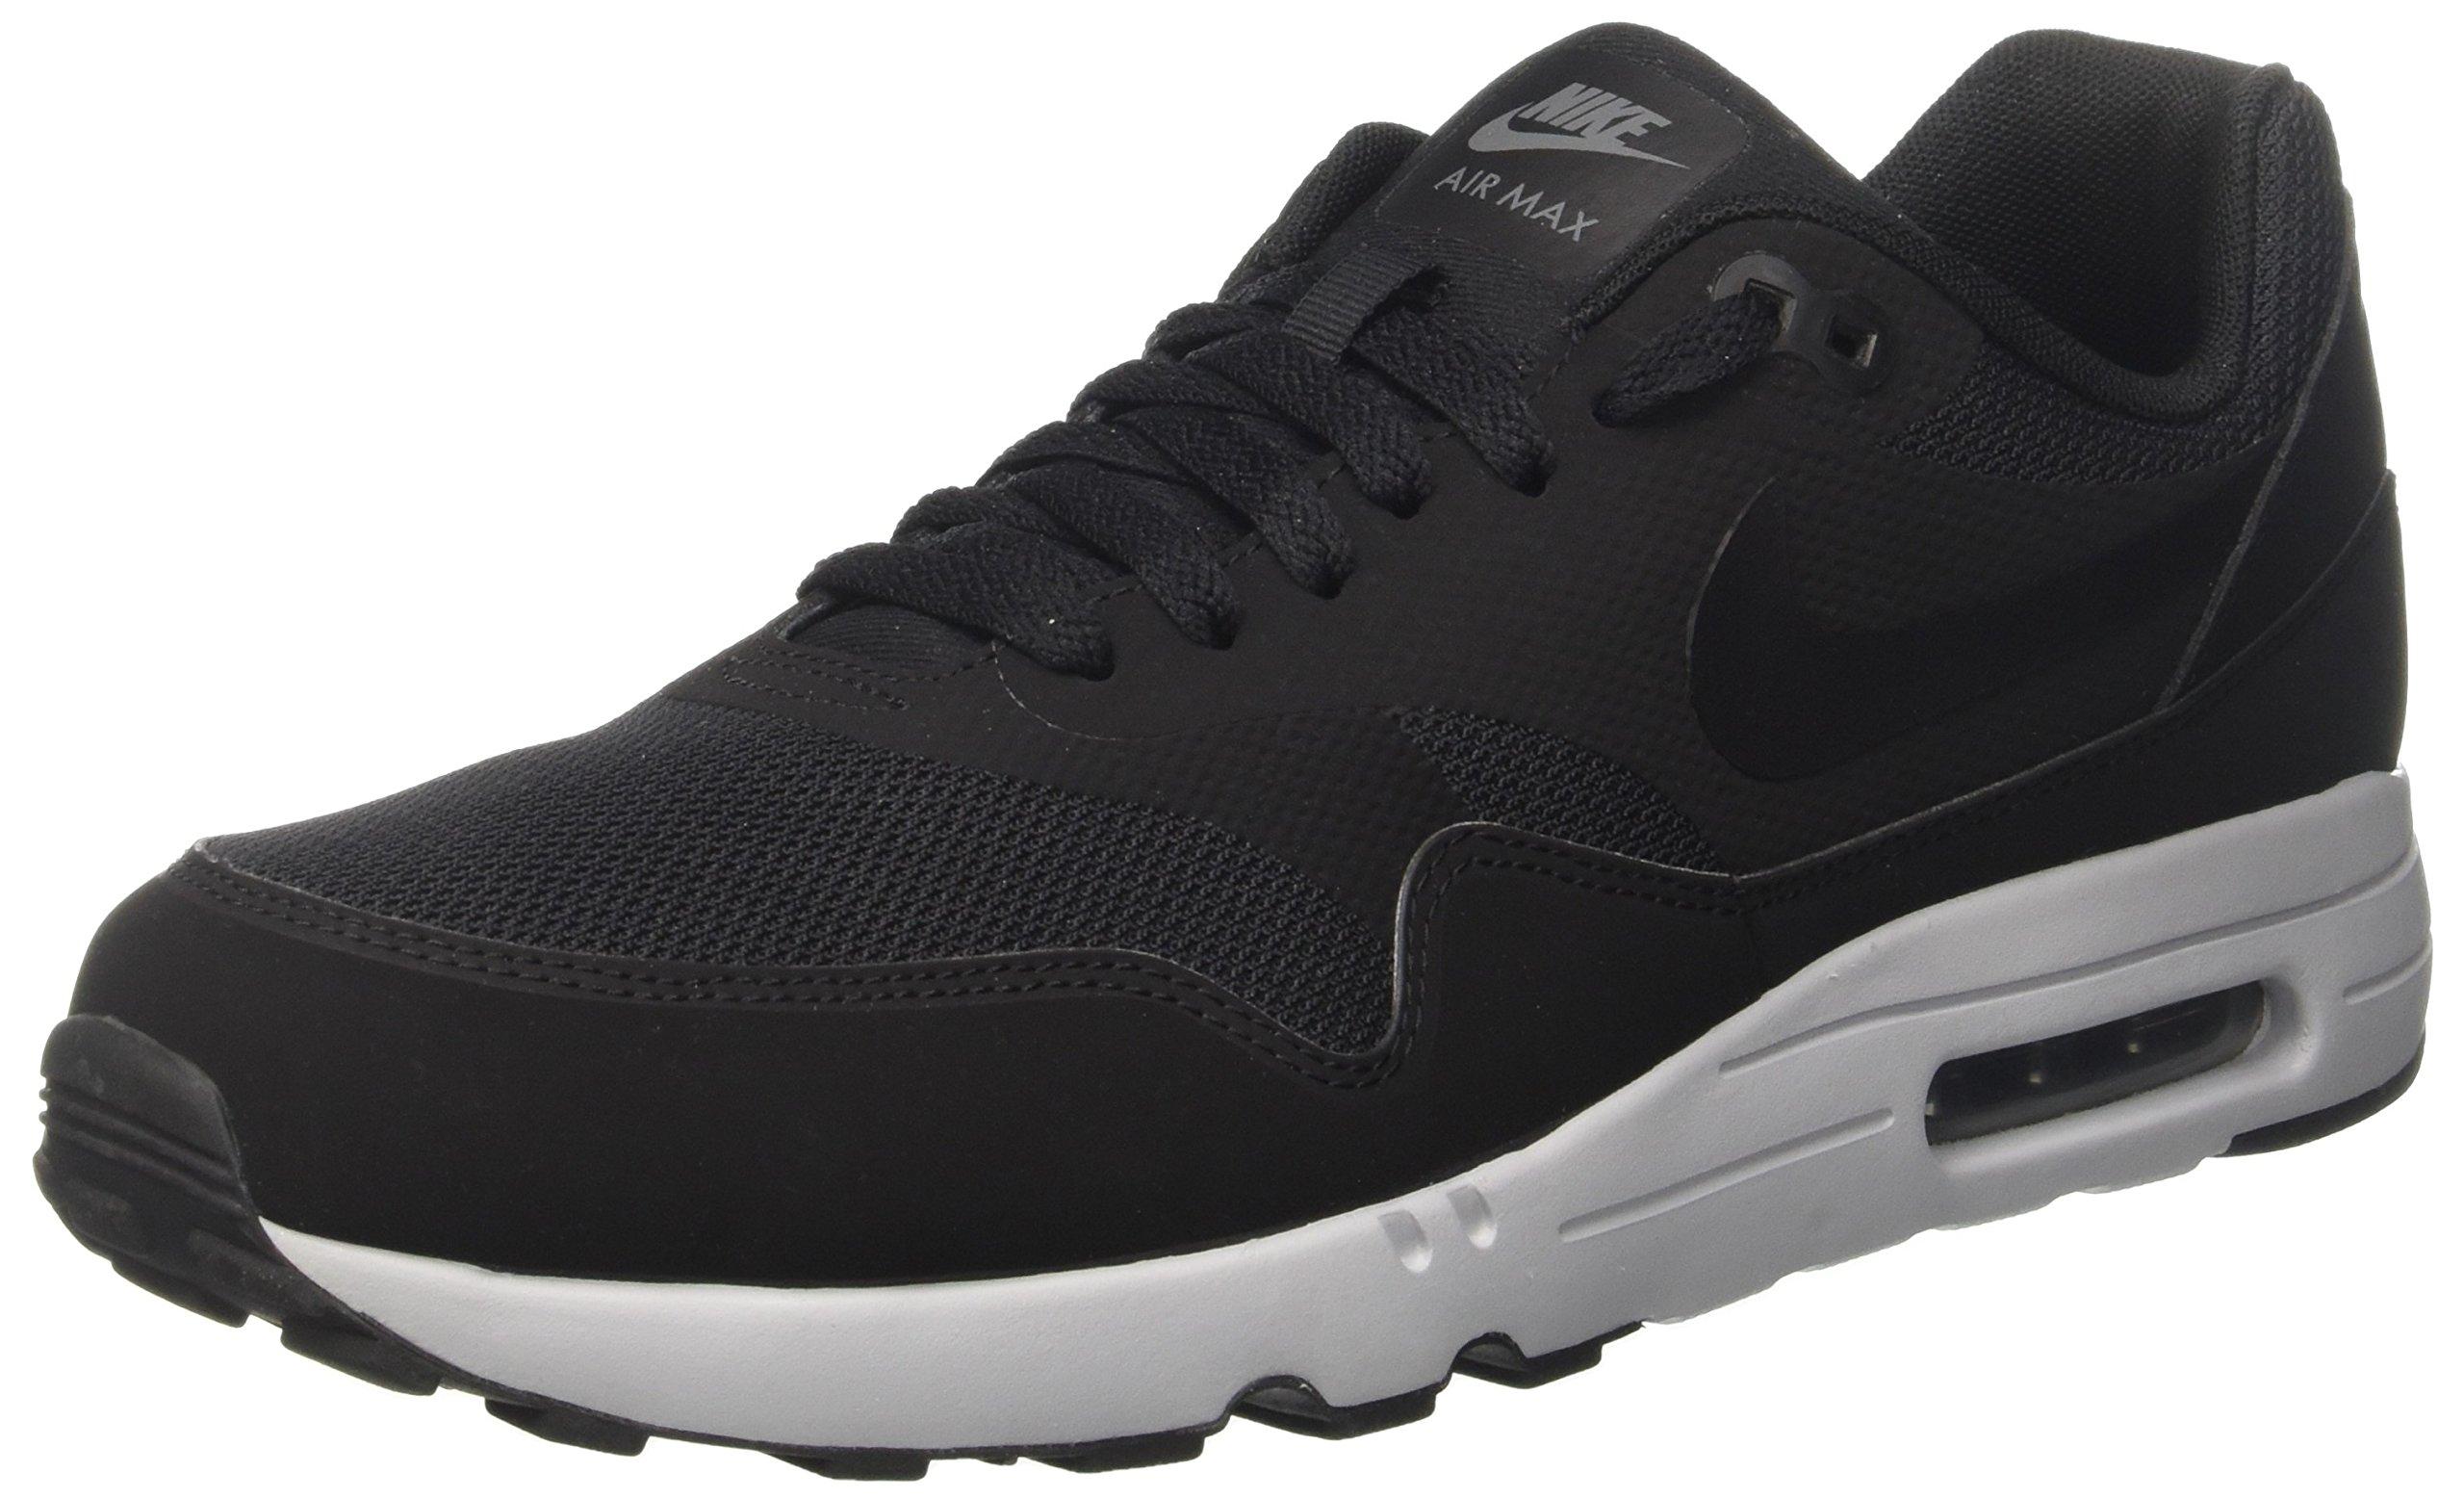 Nike Men's Air Max 1 Premium Gymnastics Shoes- Buy Online in ...